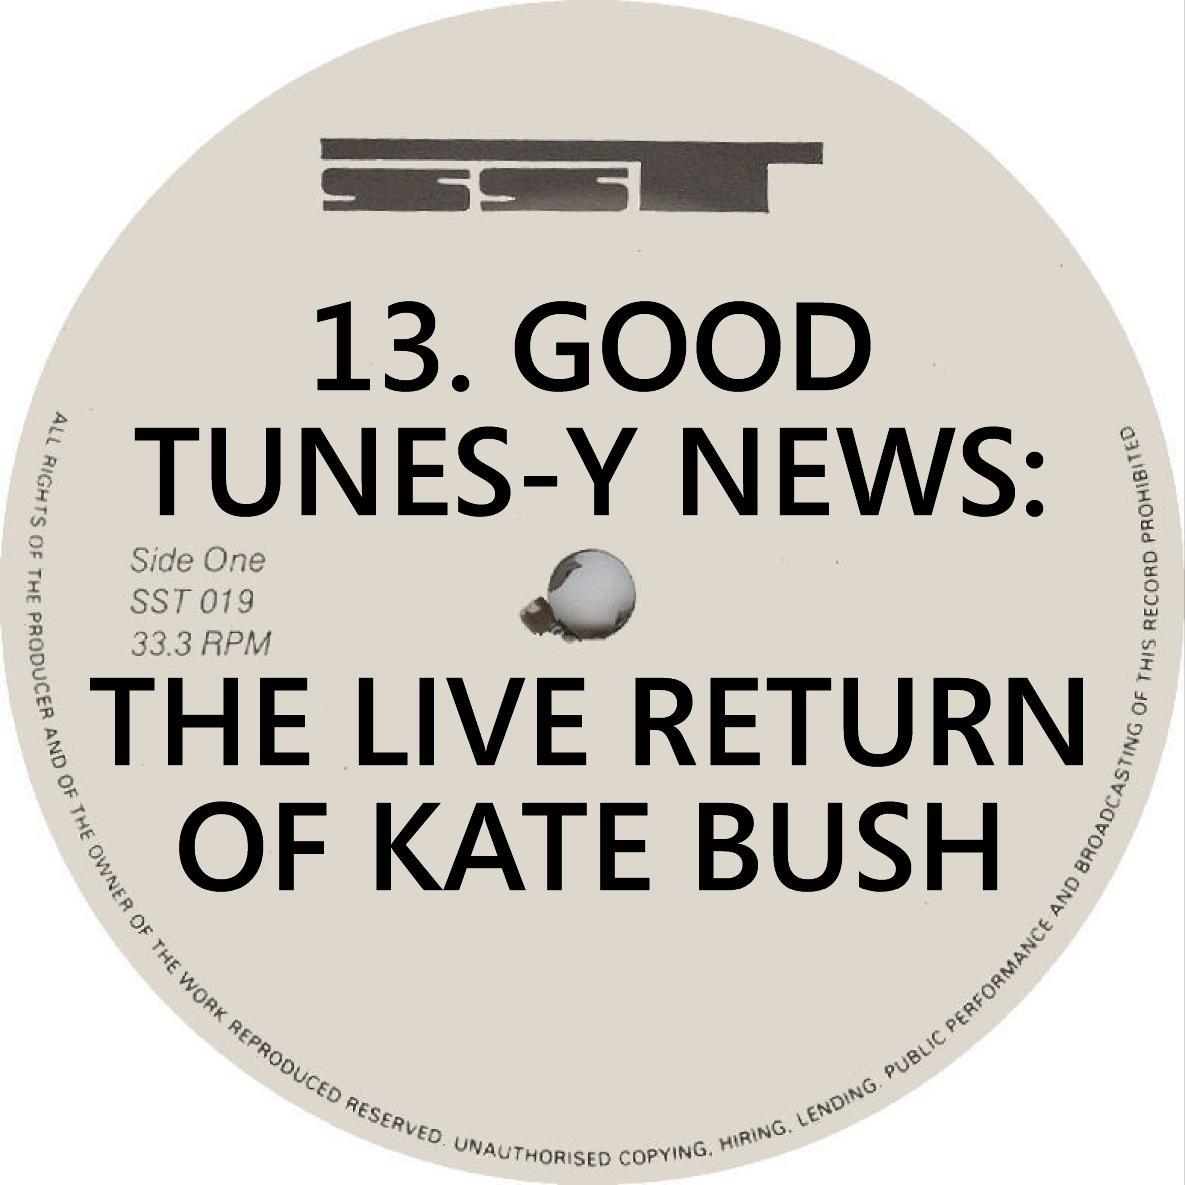 VA Good Tunes News Live Return of Kate Bush SST Records Label